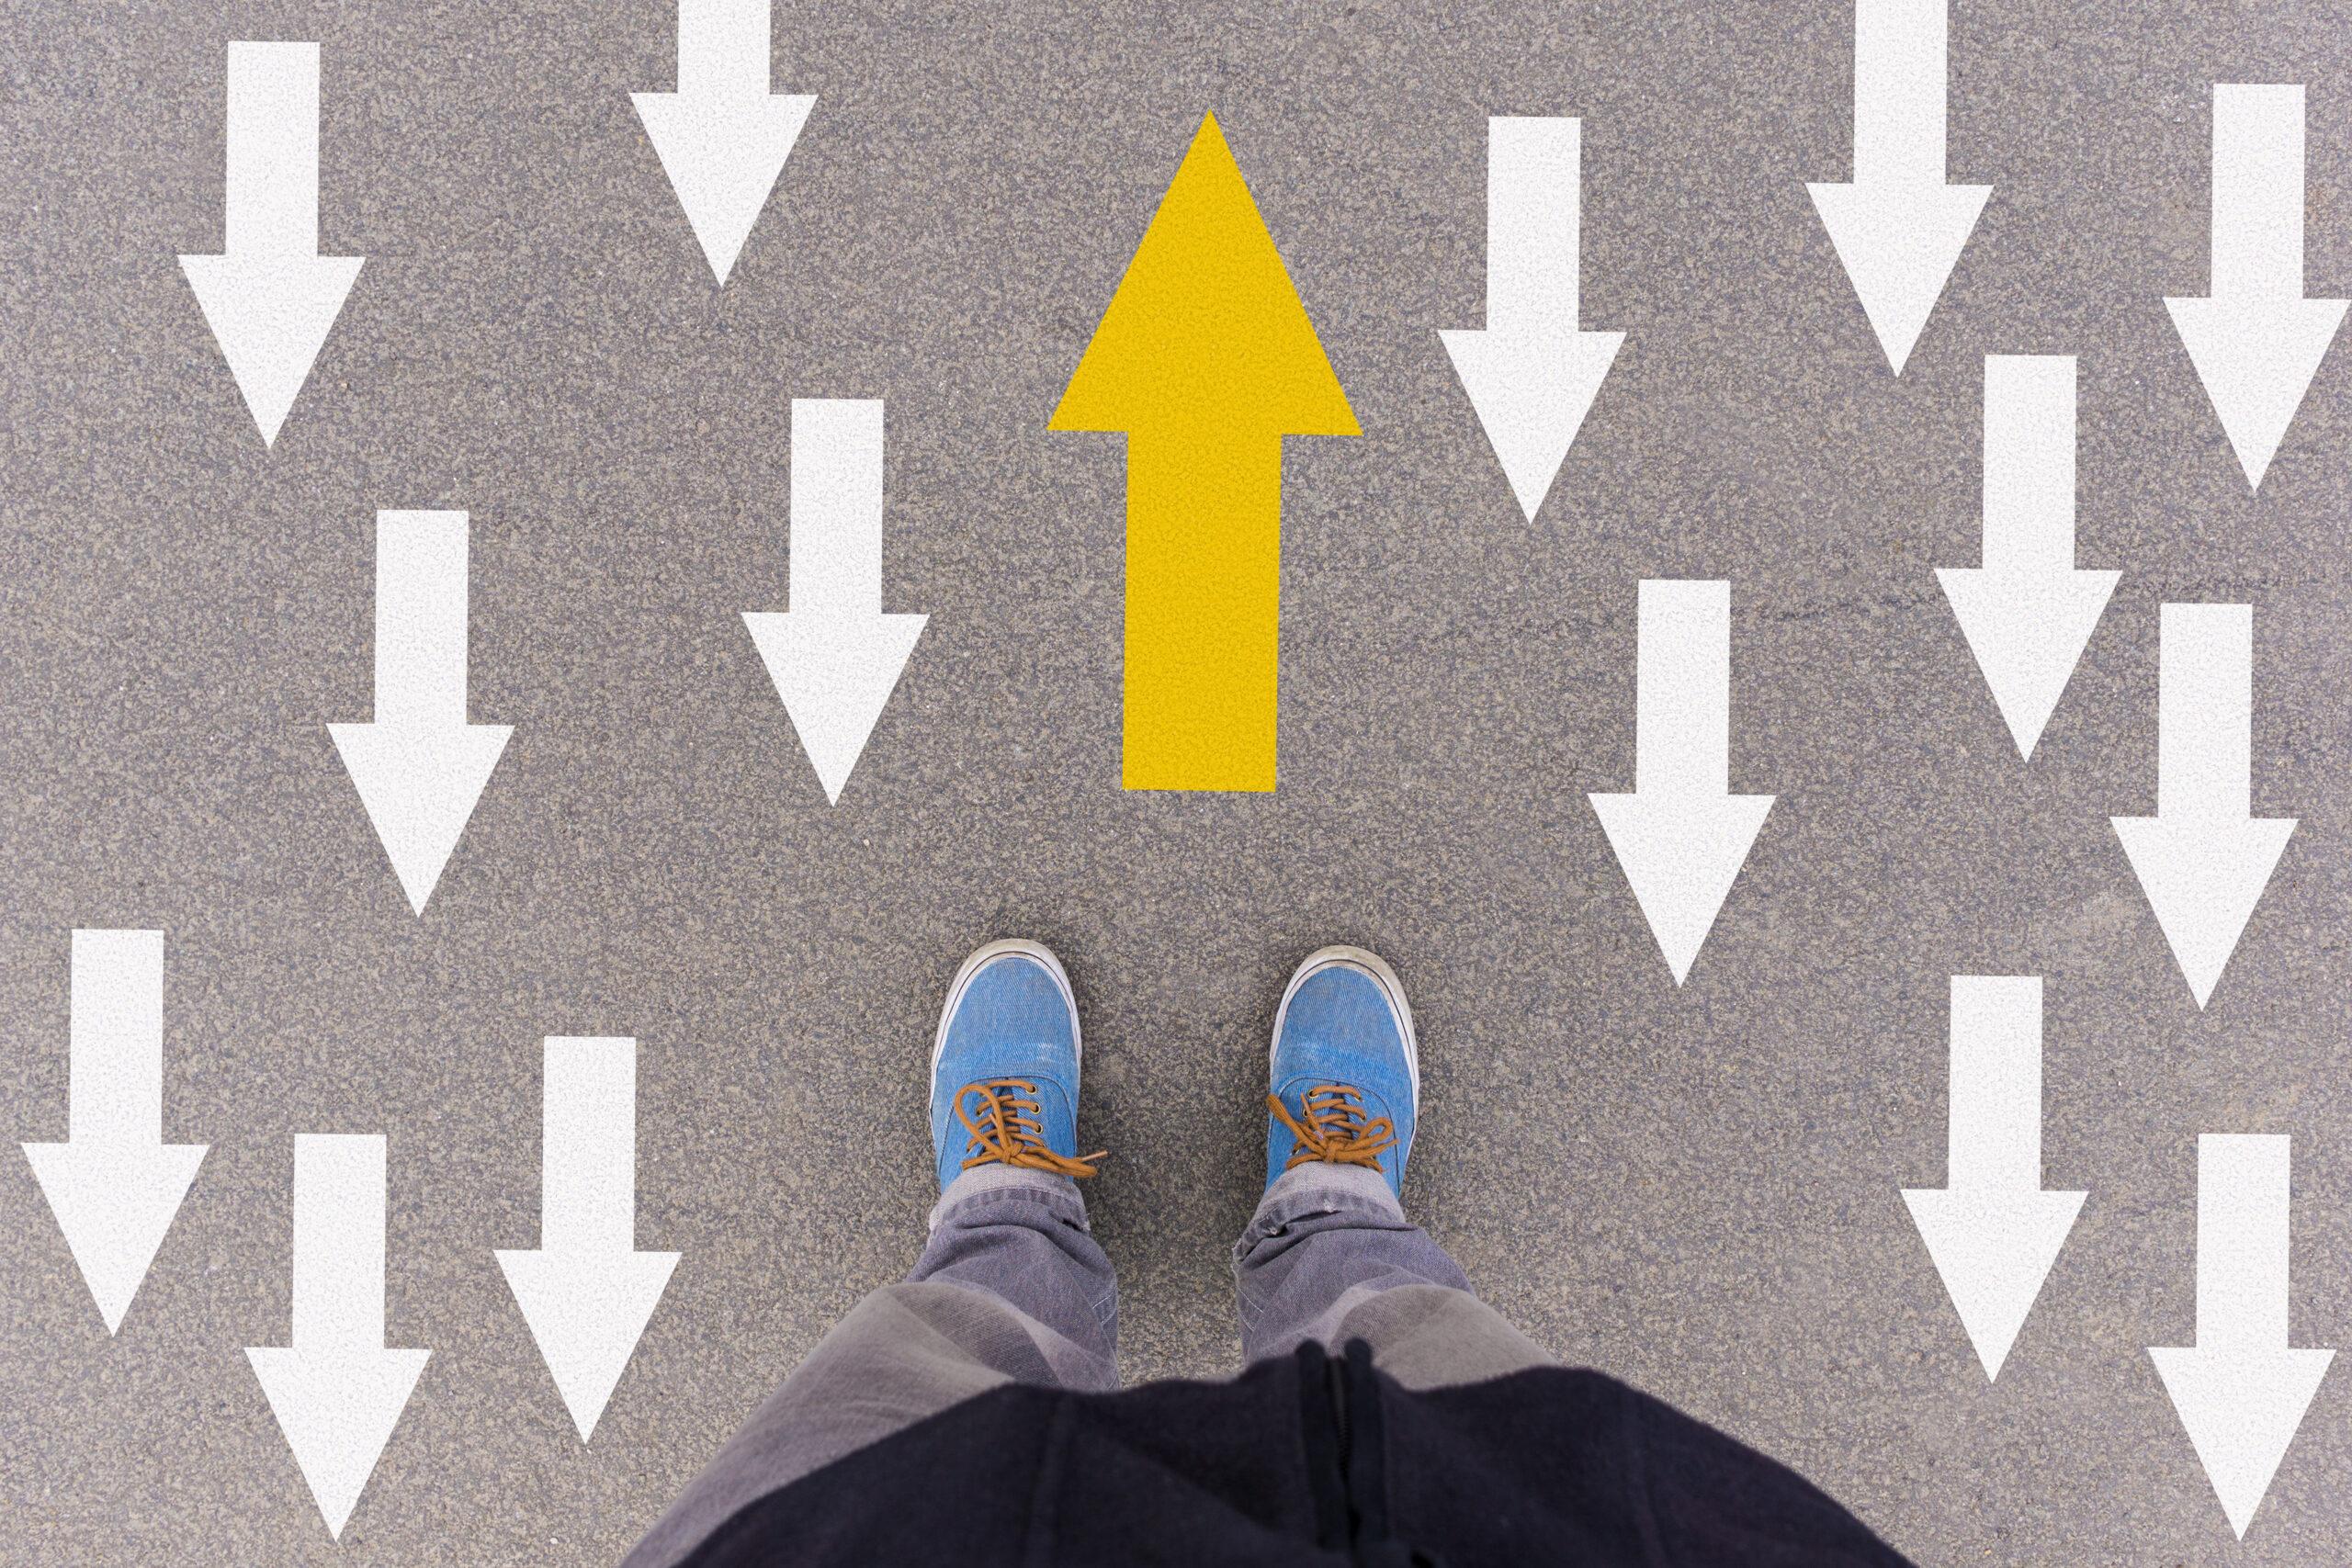 ways to move forward